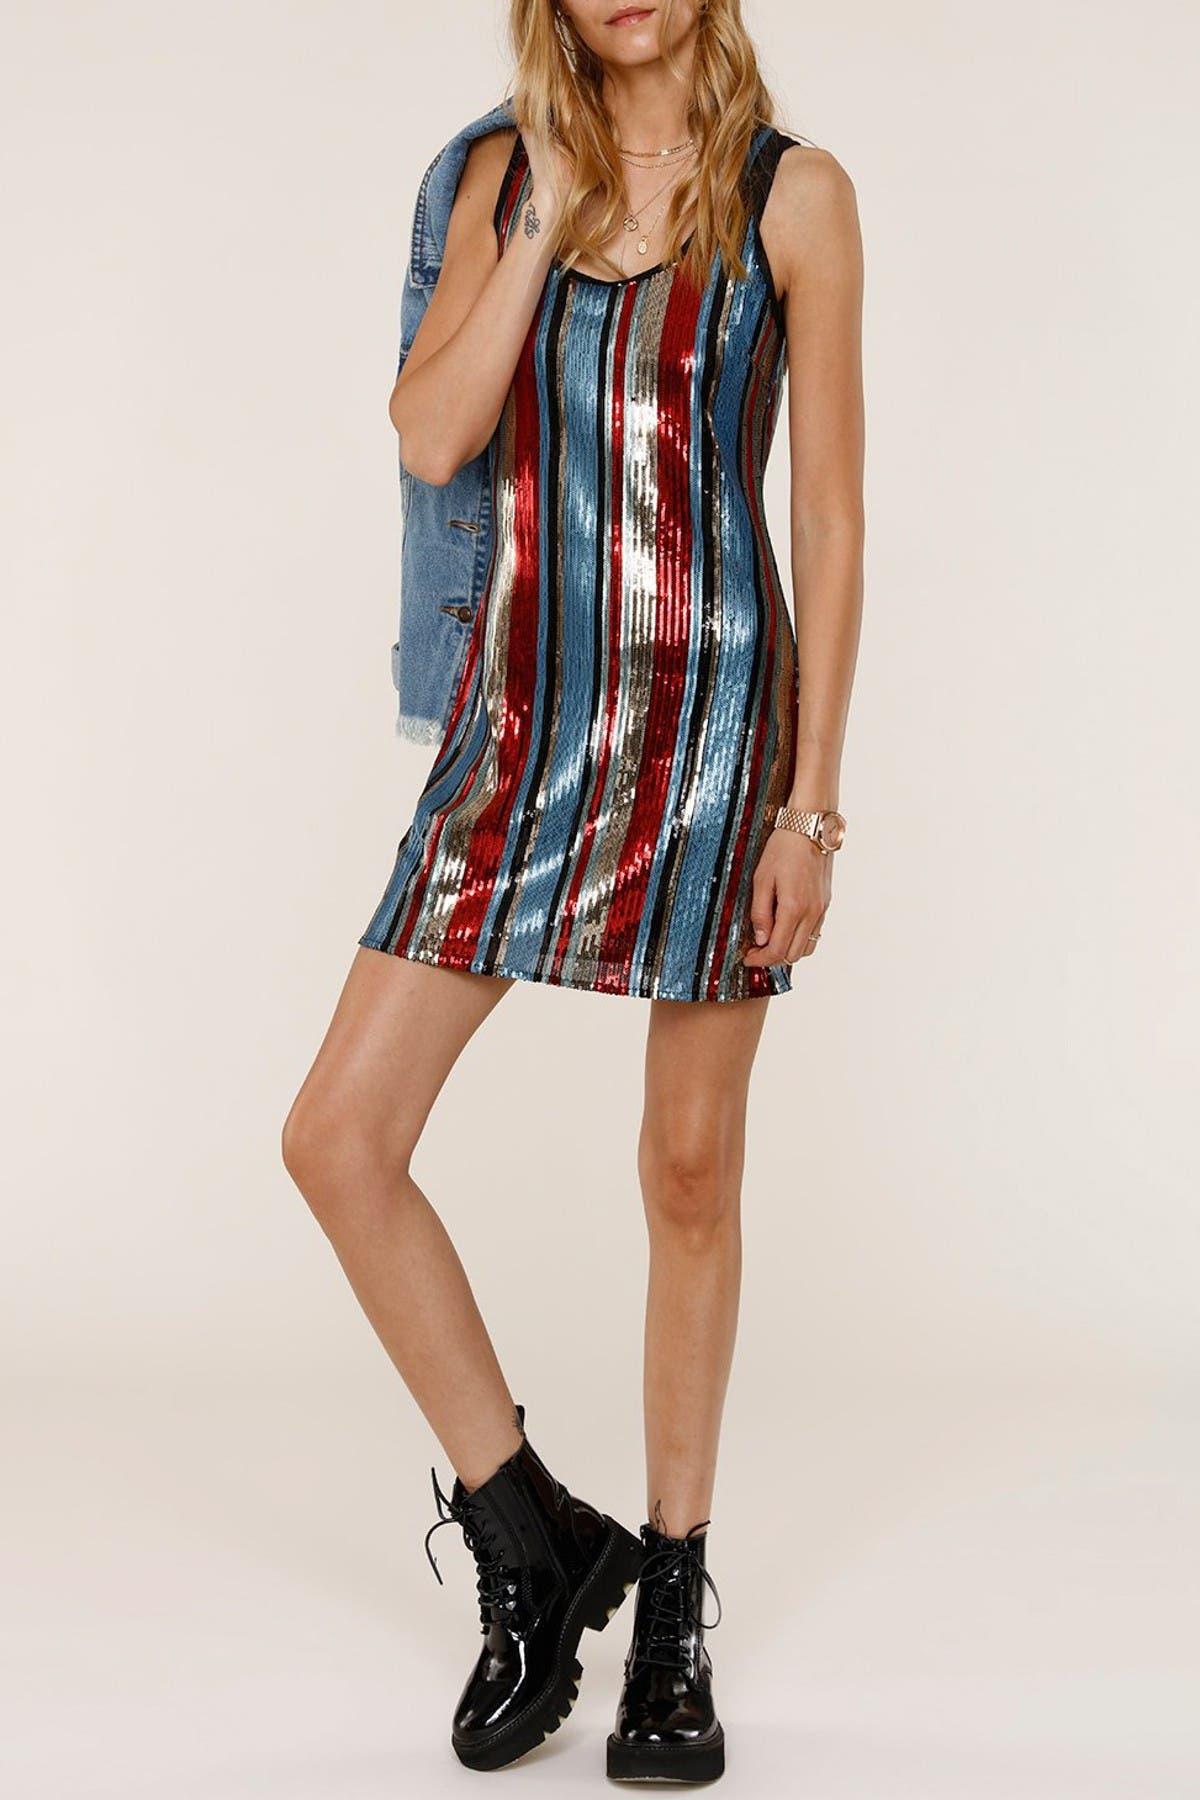 Image of Heartloom Seren Sequined Slip Mini Dress